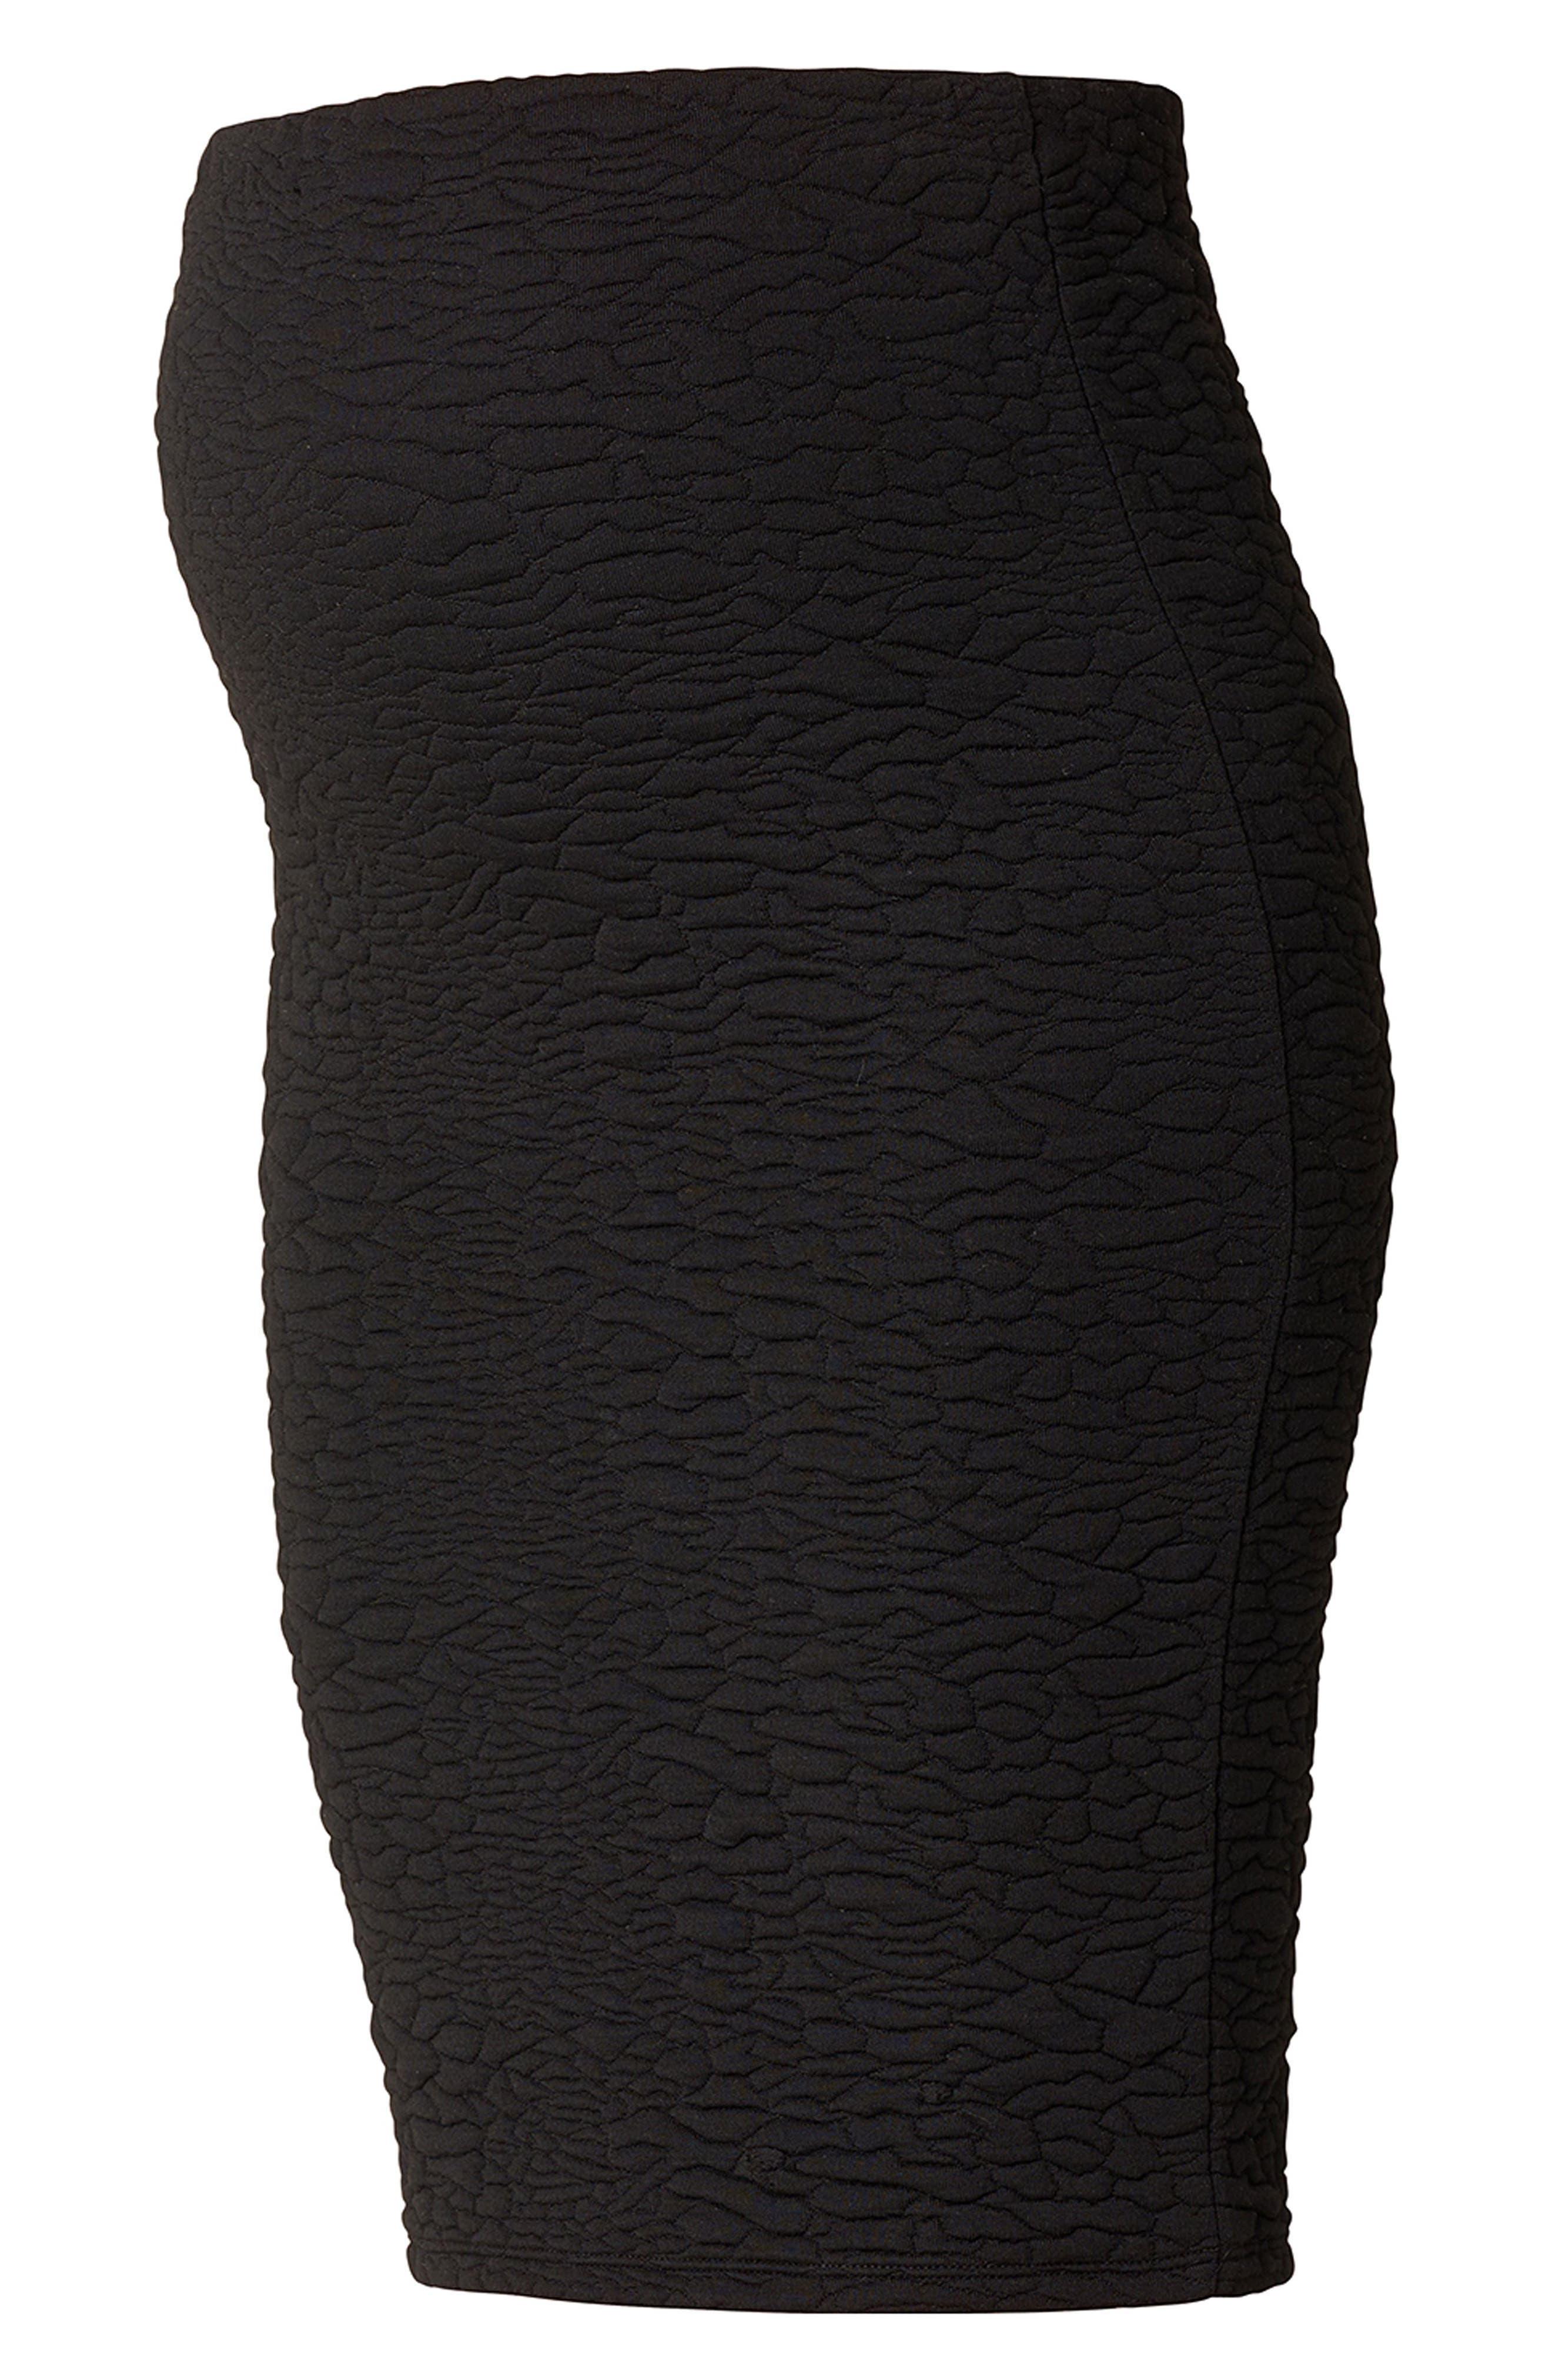 Jane Textured Knit Maternity Skirt,                             Alternate thumbnail 2, color,                             BLACK